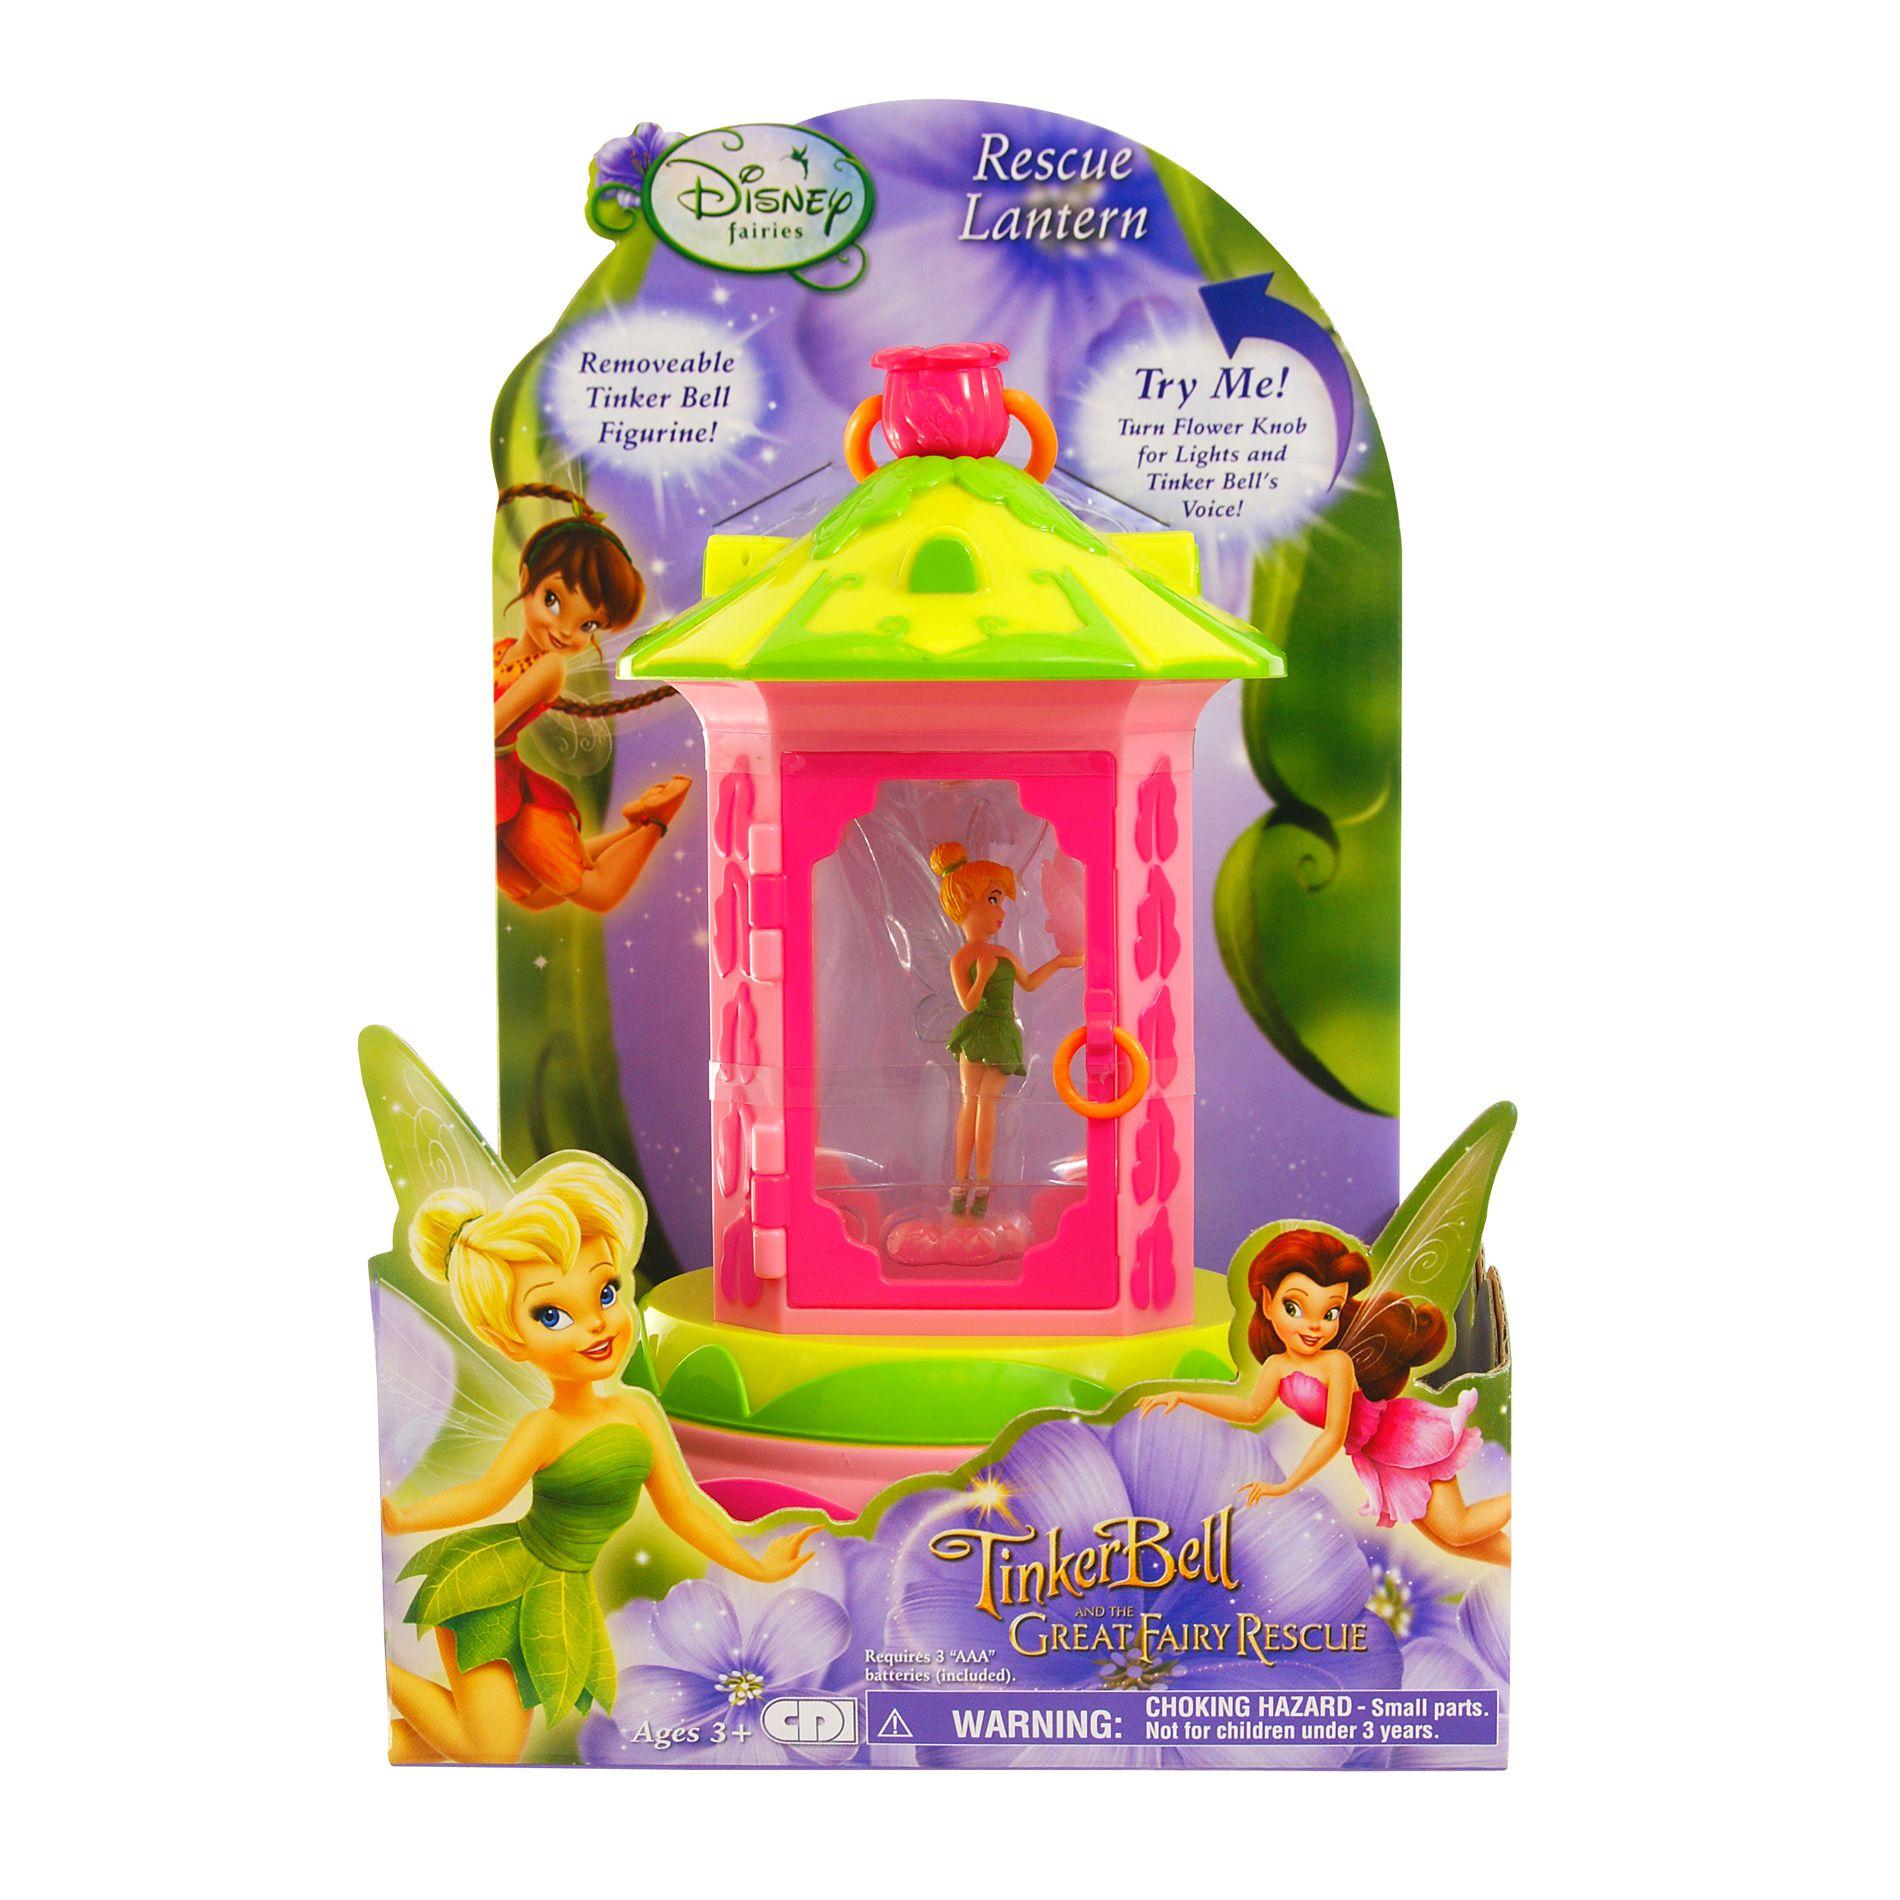 Disney Fairies Rescue Lantern - Tinker Bell PartNumber: 05215939000P KsnValue: 05215939000 MfgPartNumber: 21168